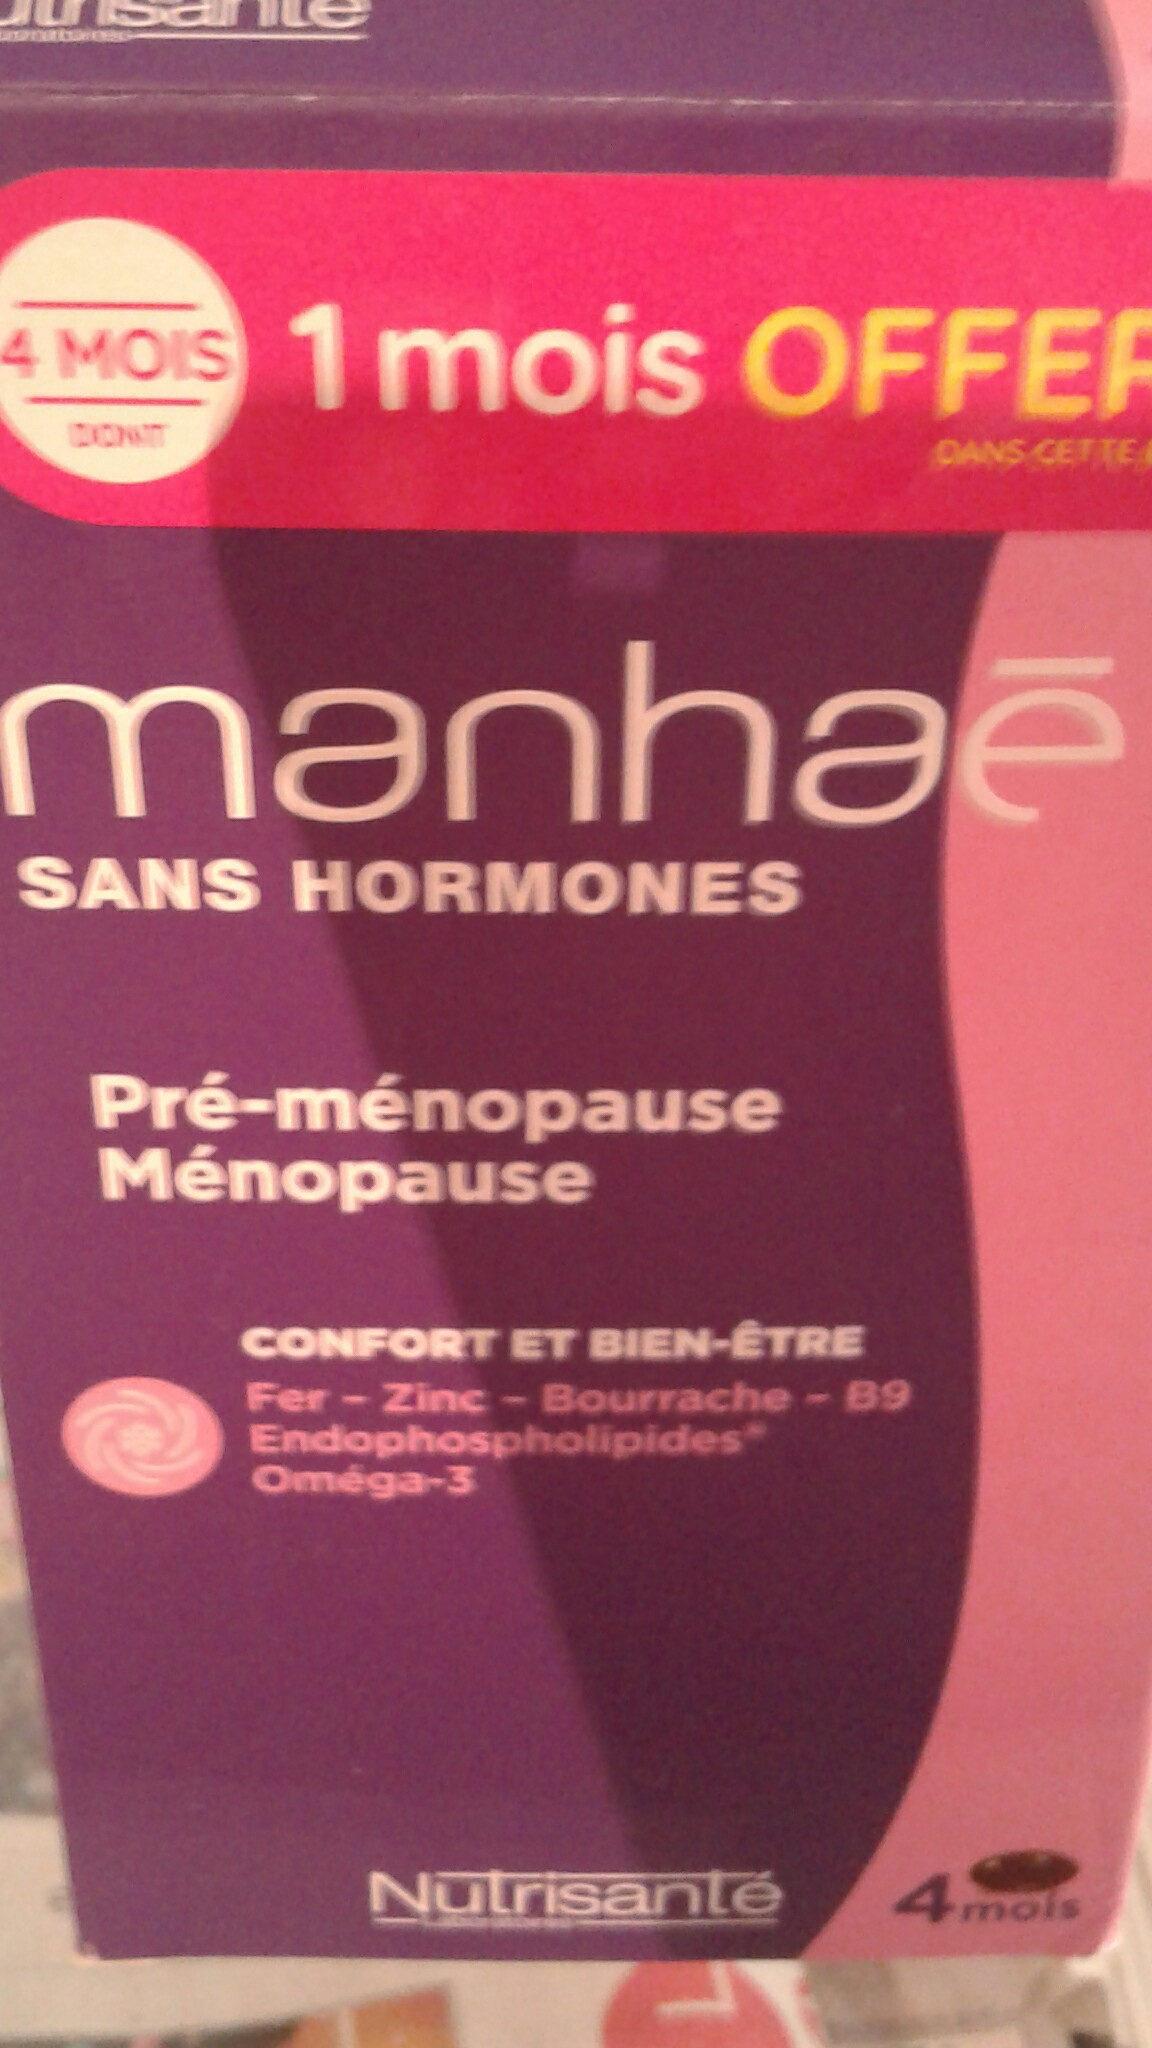 Nutrisanté Manhaé Féminité Ménopause - Produit - fr